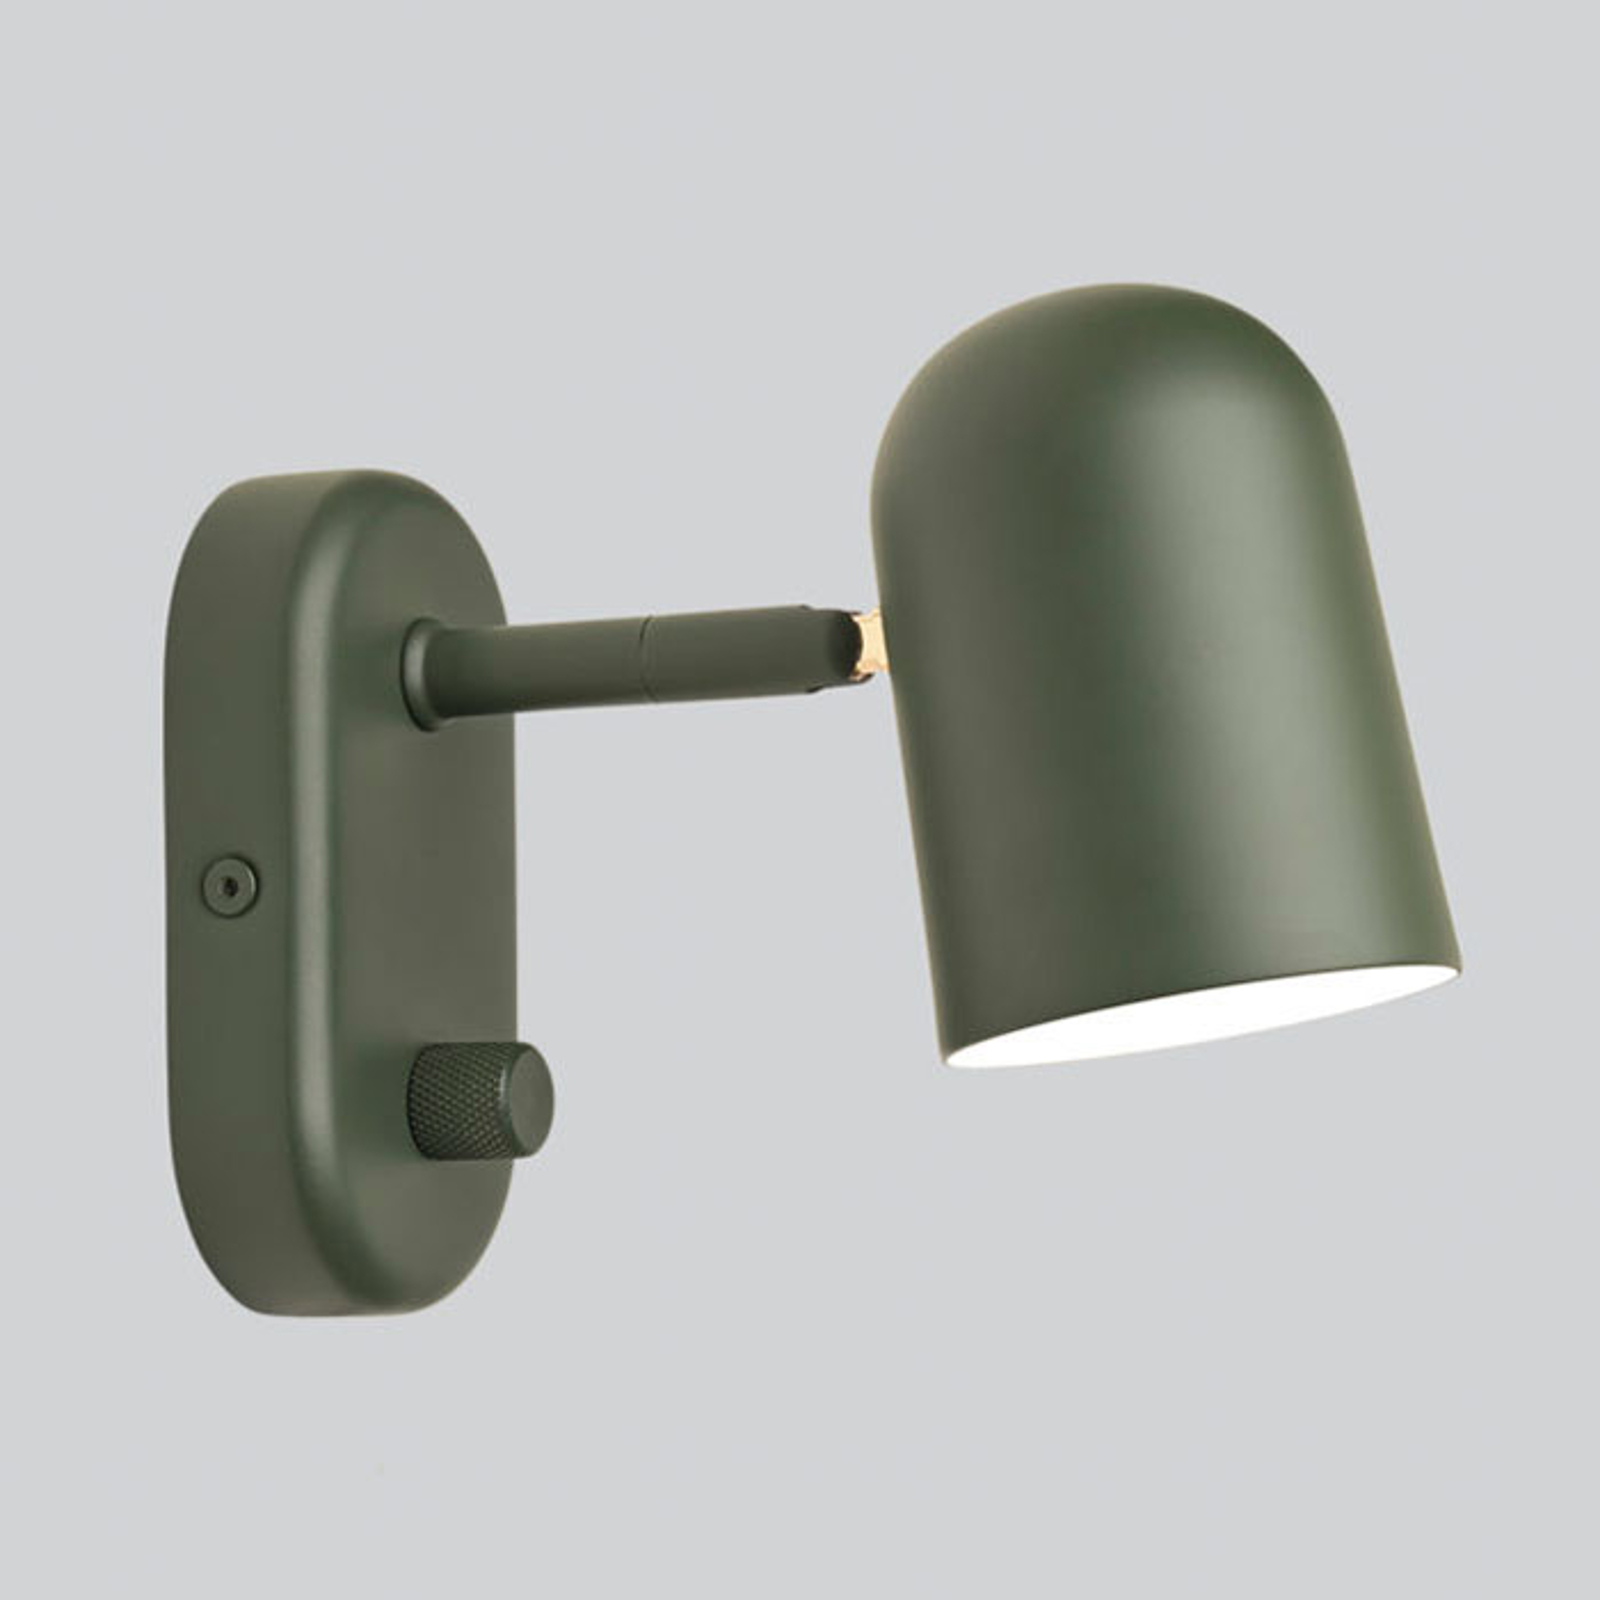 Northern wandlamp Buddy wall donkergroen